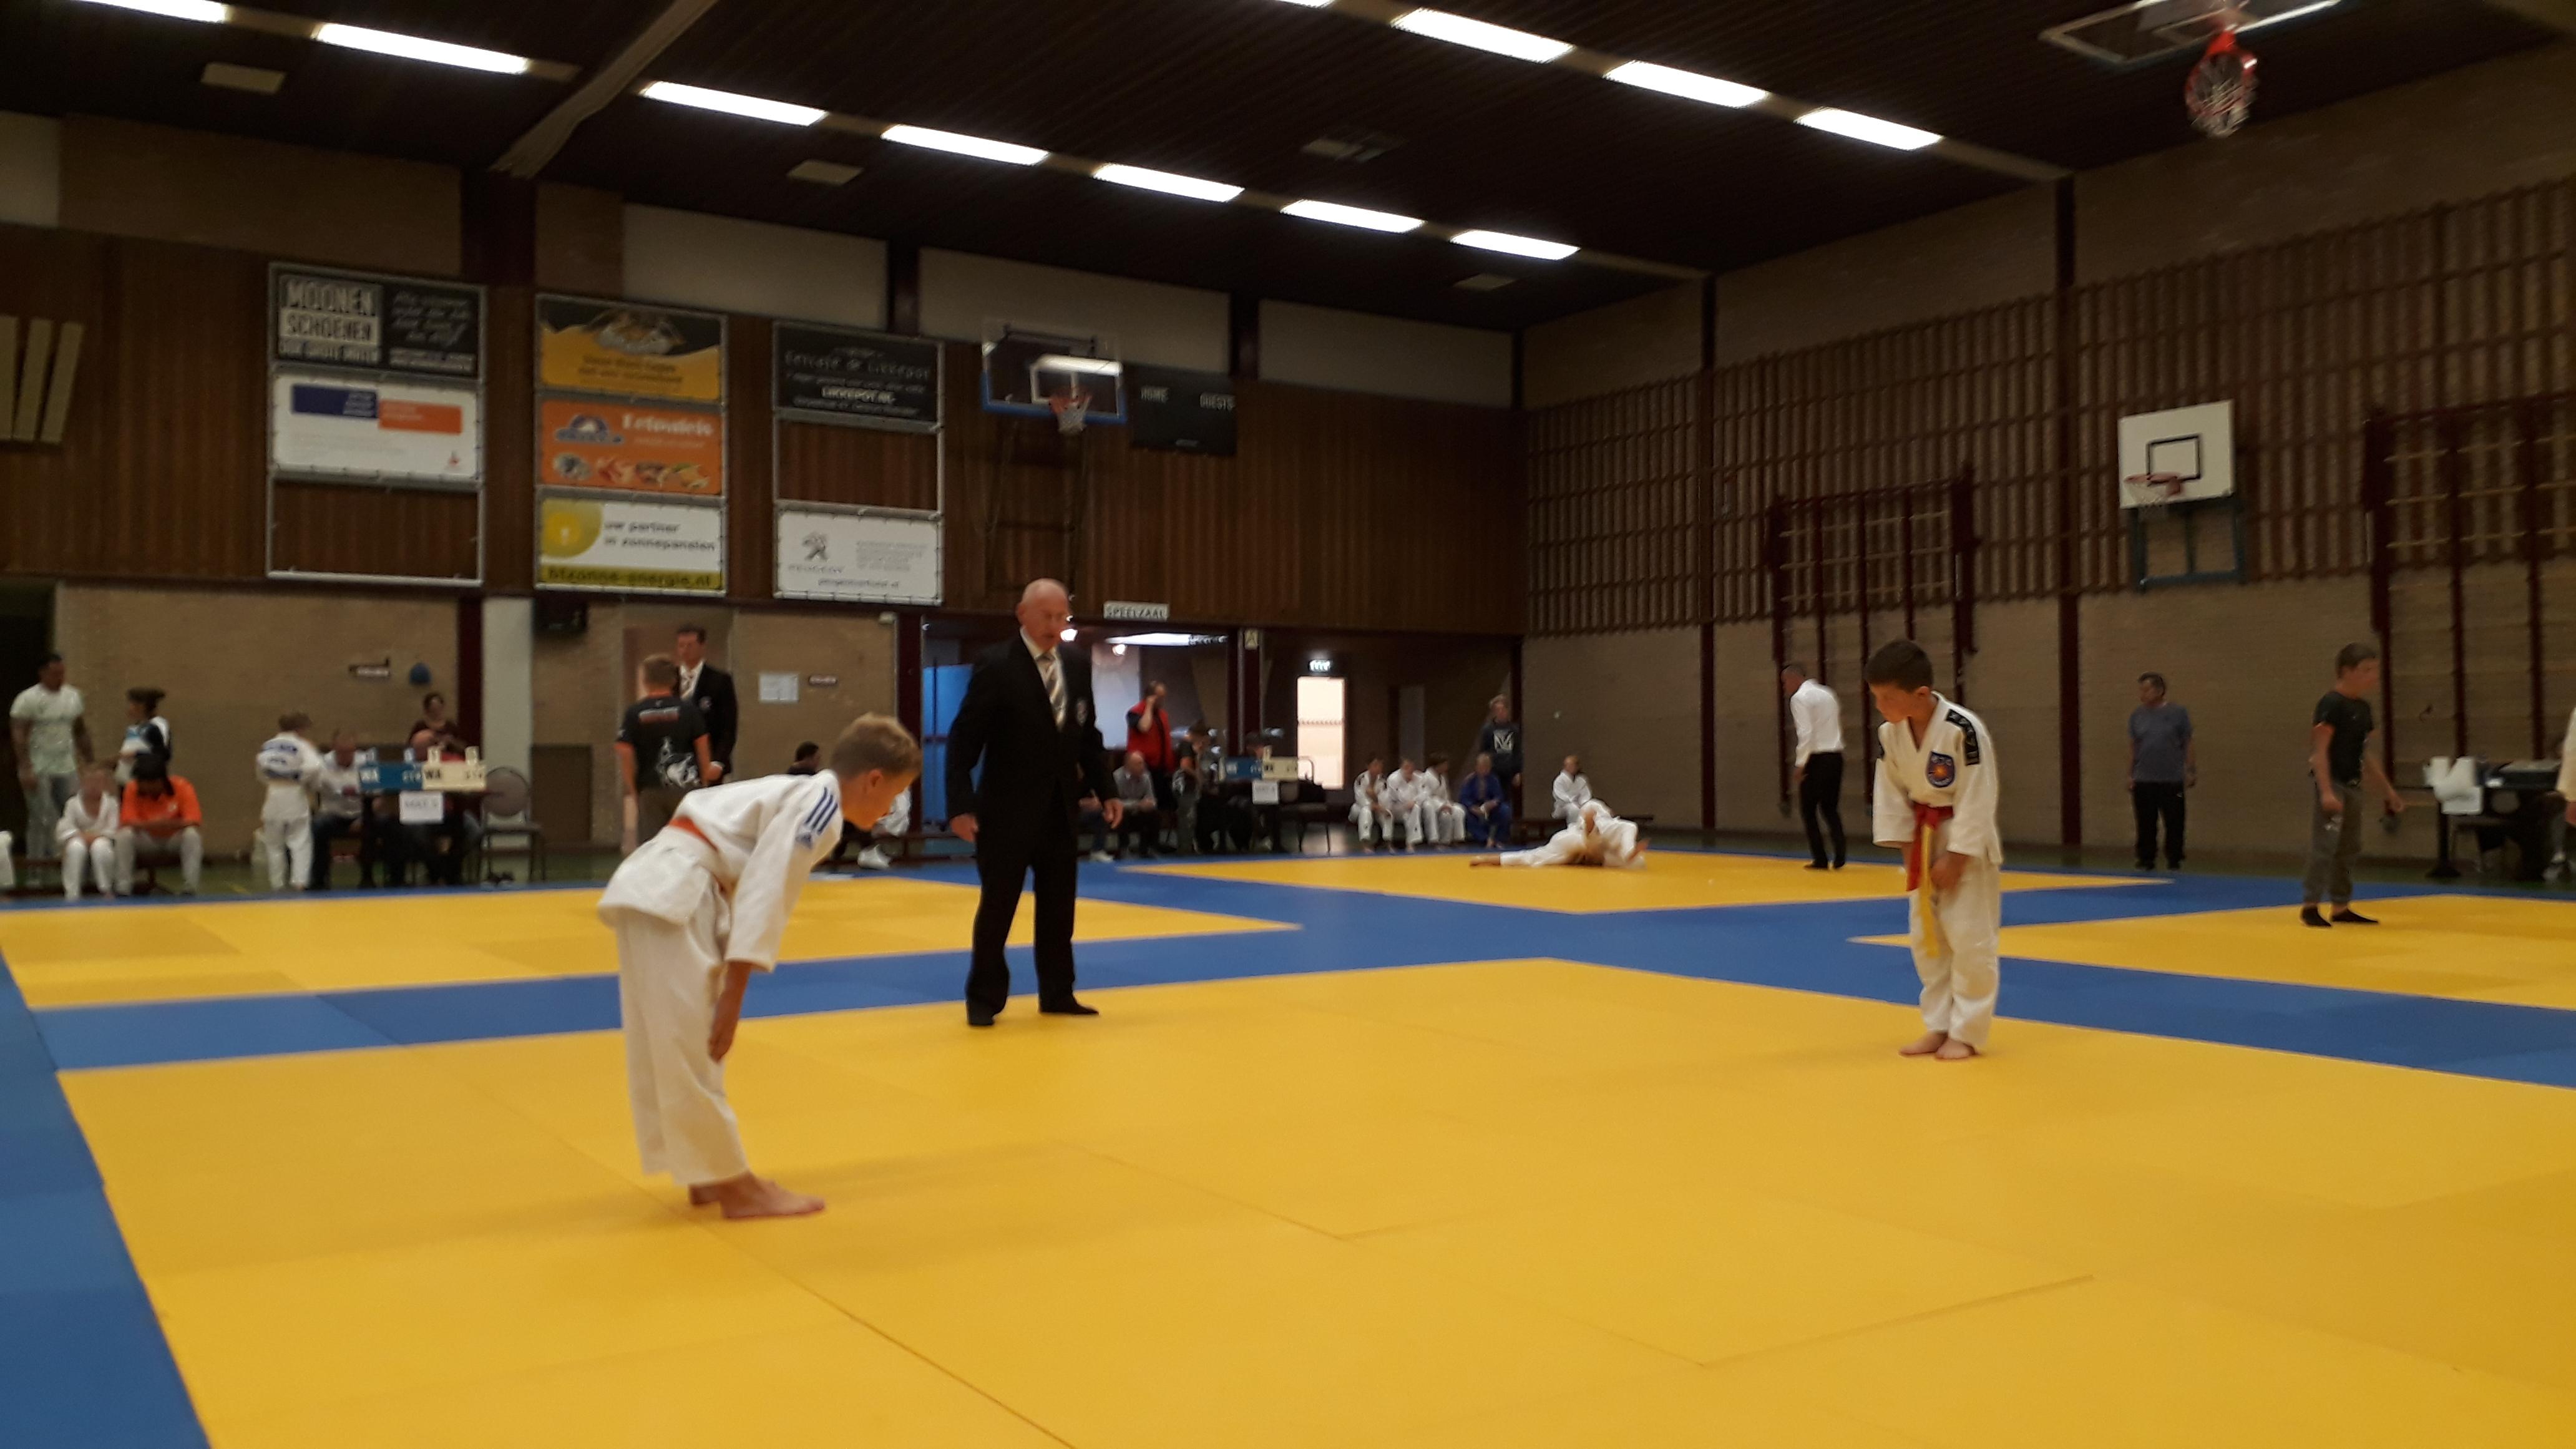 Goed begin Schijndelse judoka's in Rosmalen